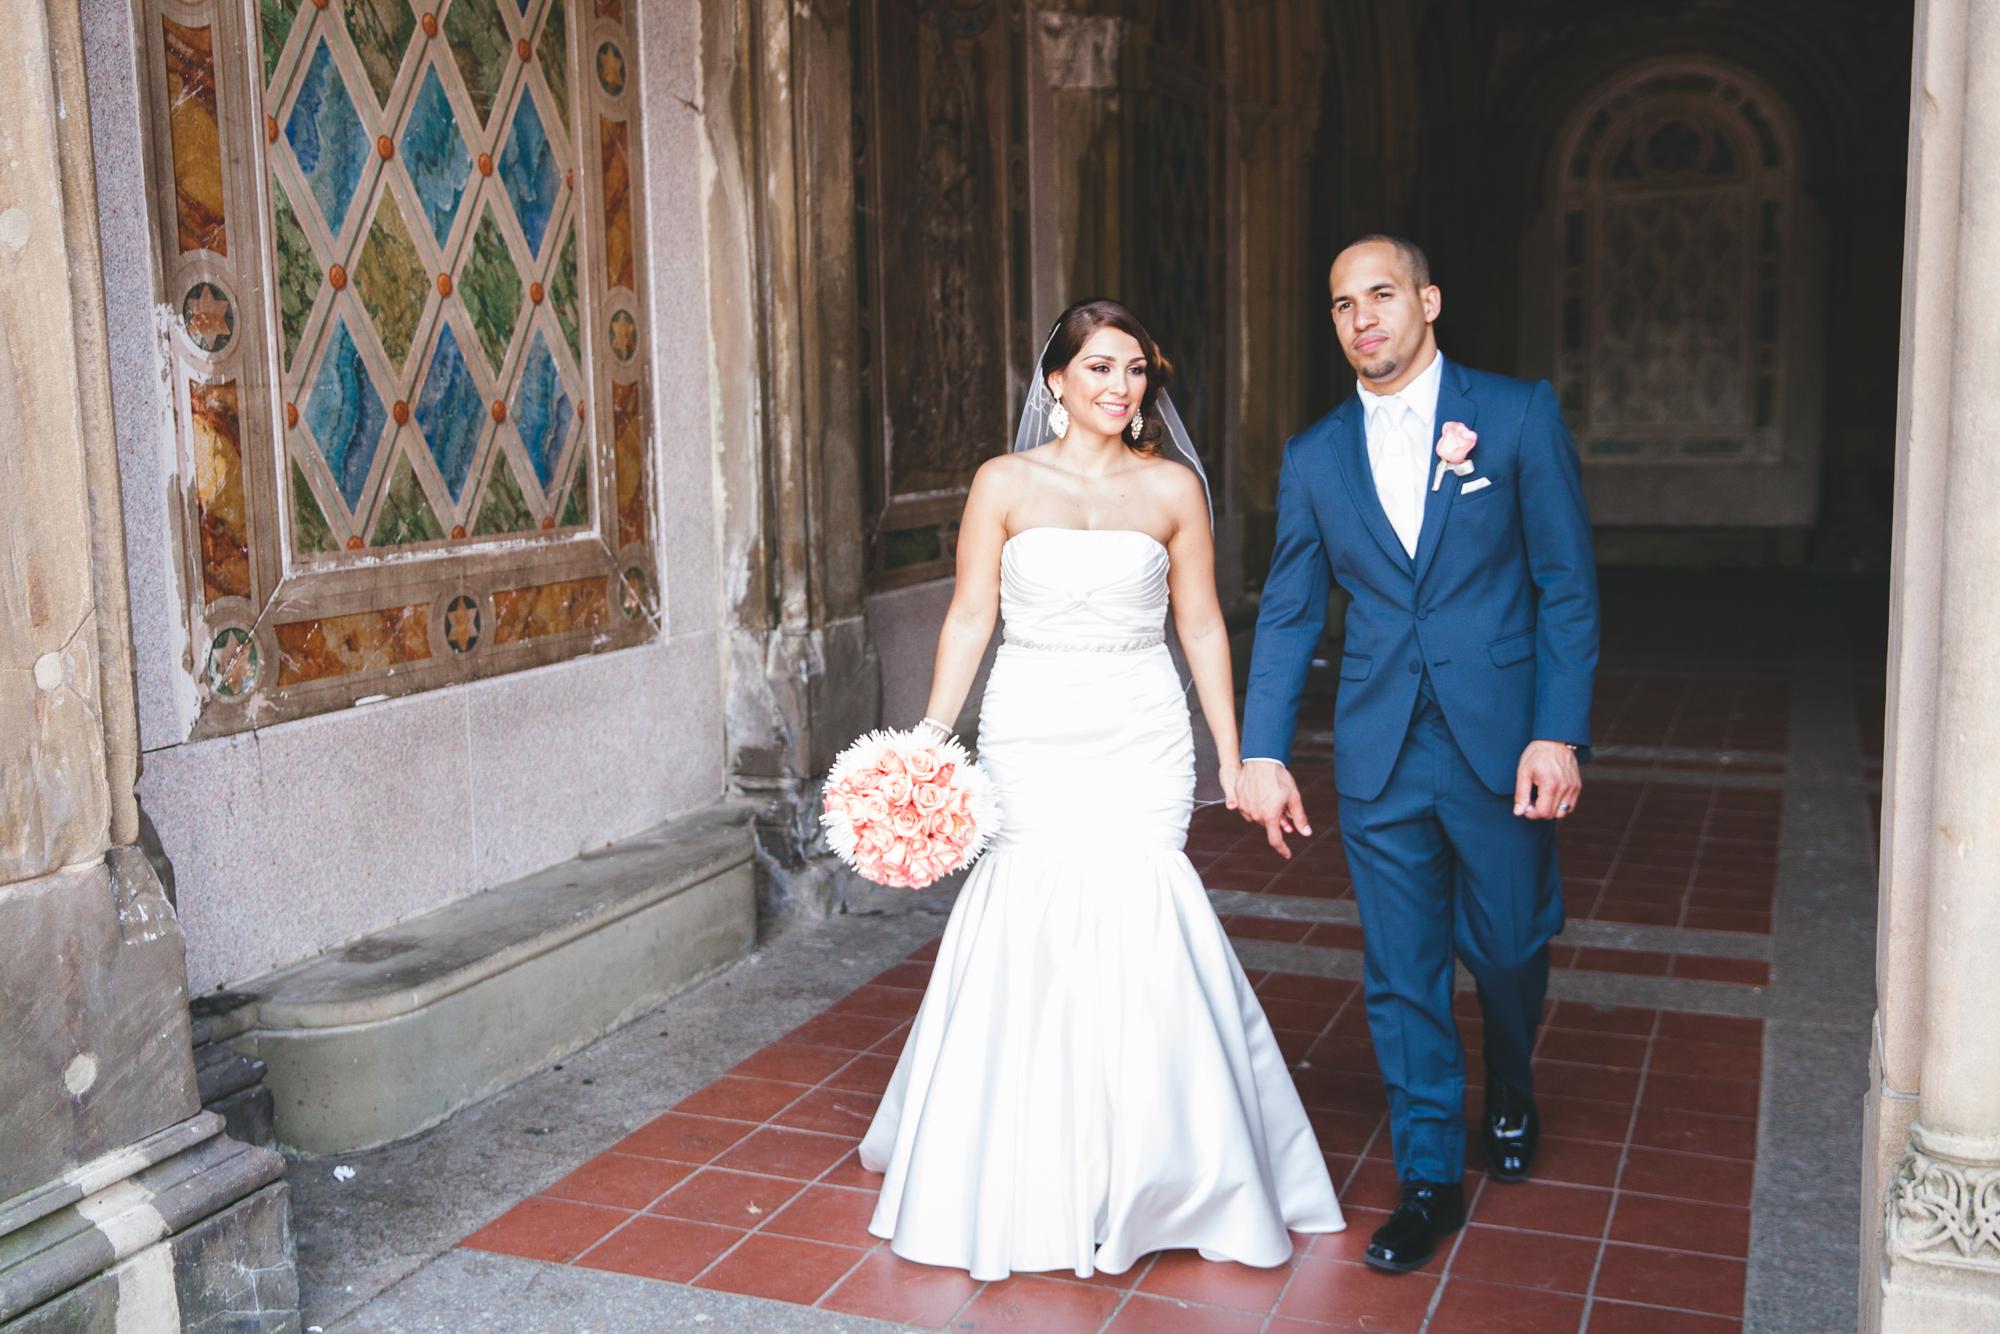 PriscillaJeffrey-Central-Park-Wedding-Elopement-Photography-NYC-31.jpg